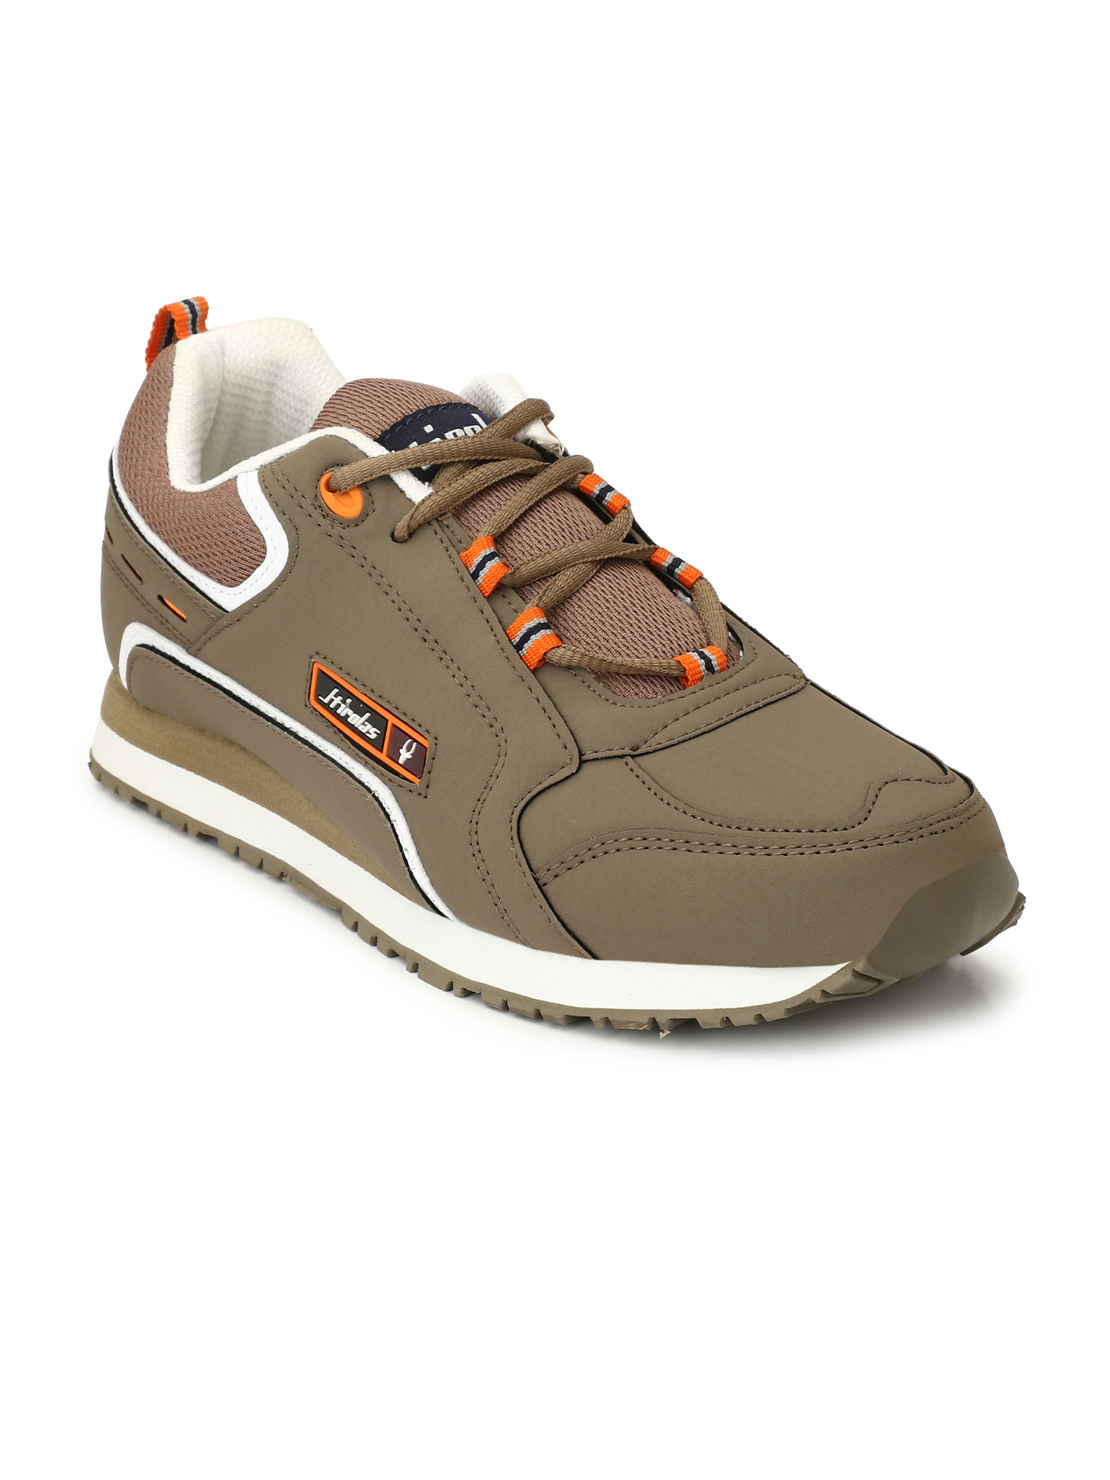 Hirolas   Hirolas Men's Multisport Sneaker Shoes- Chickoo